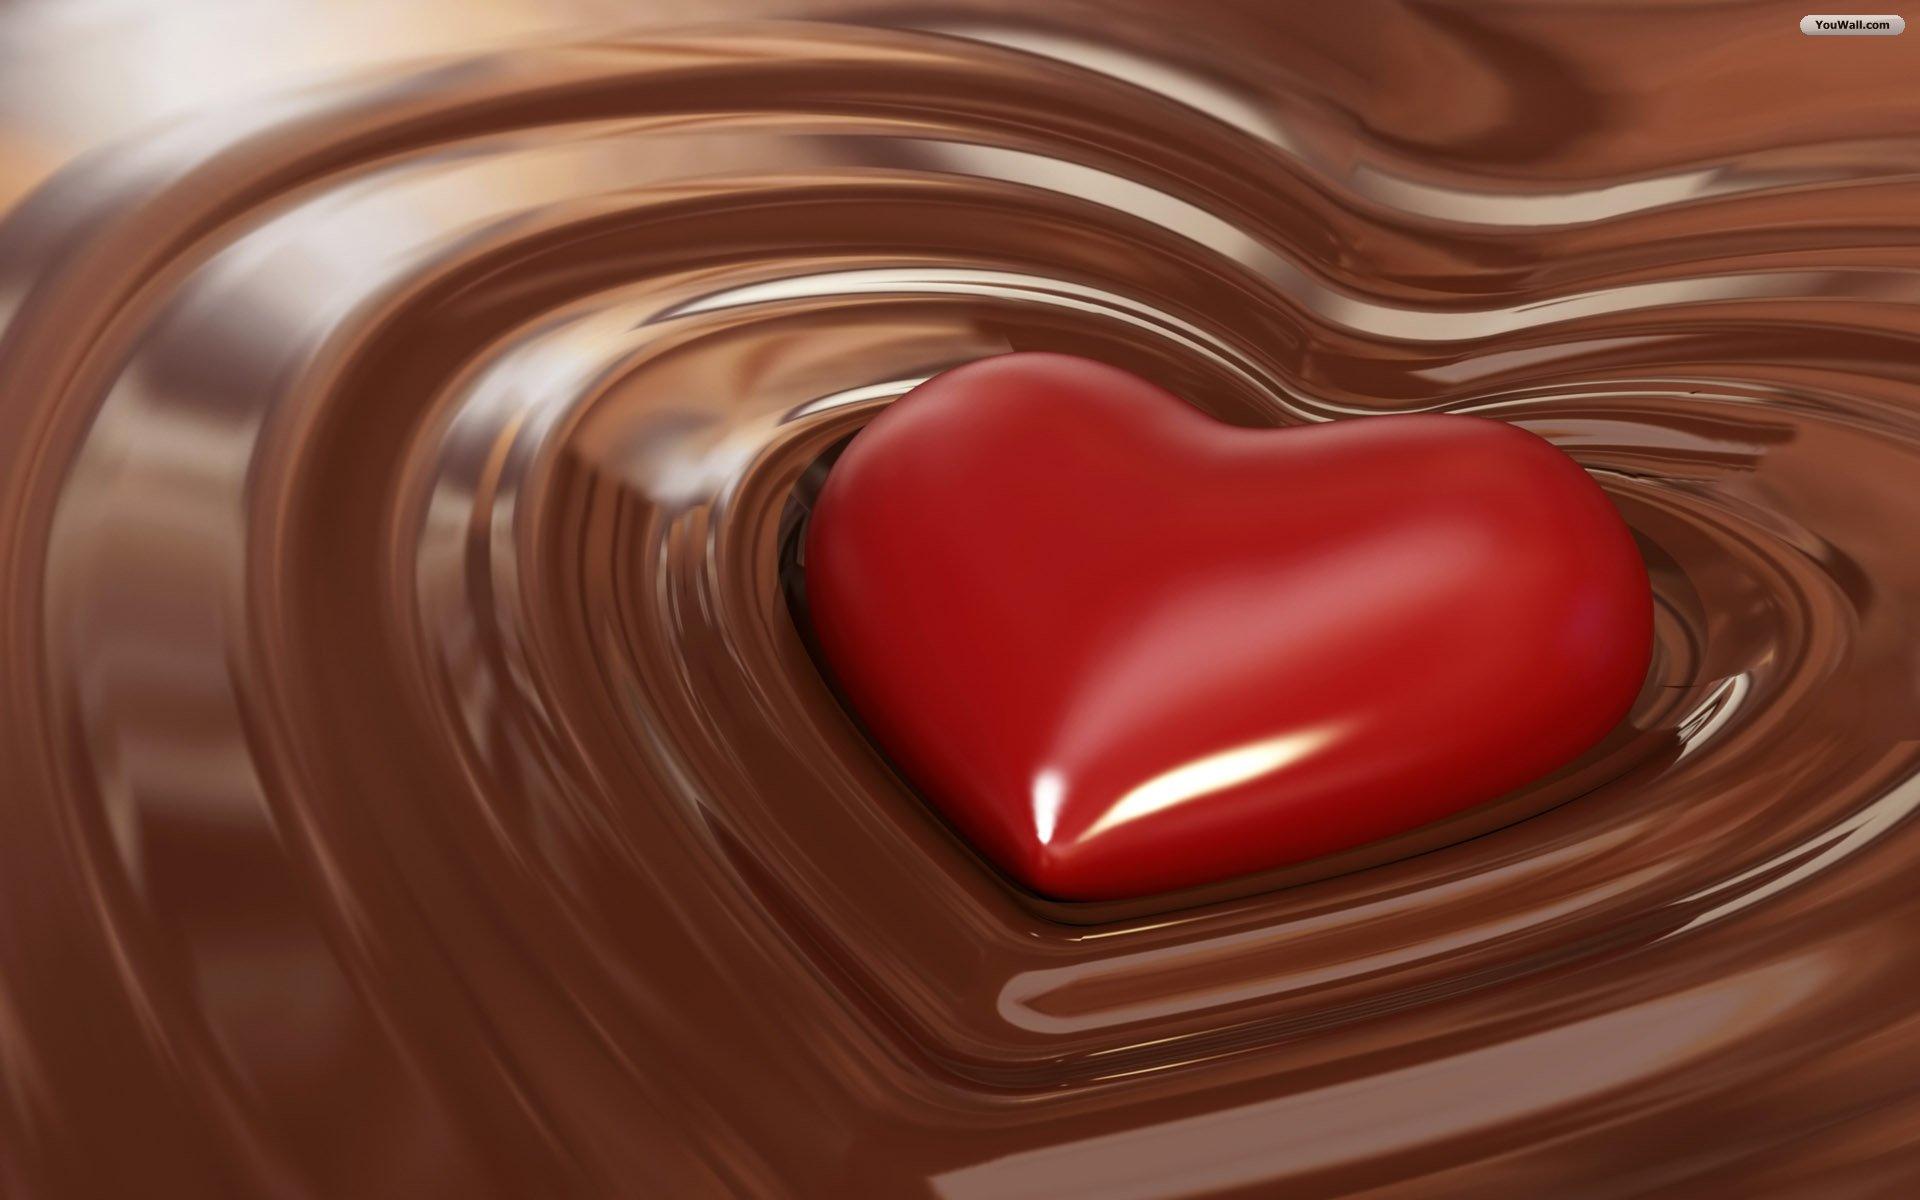 Chocolate With Love Wallpaper   wallpaperwallpapersfree wallpaper 1920x1200